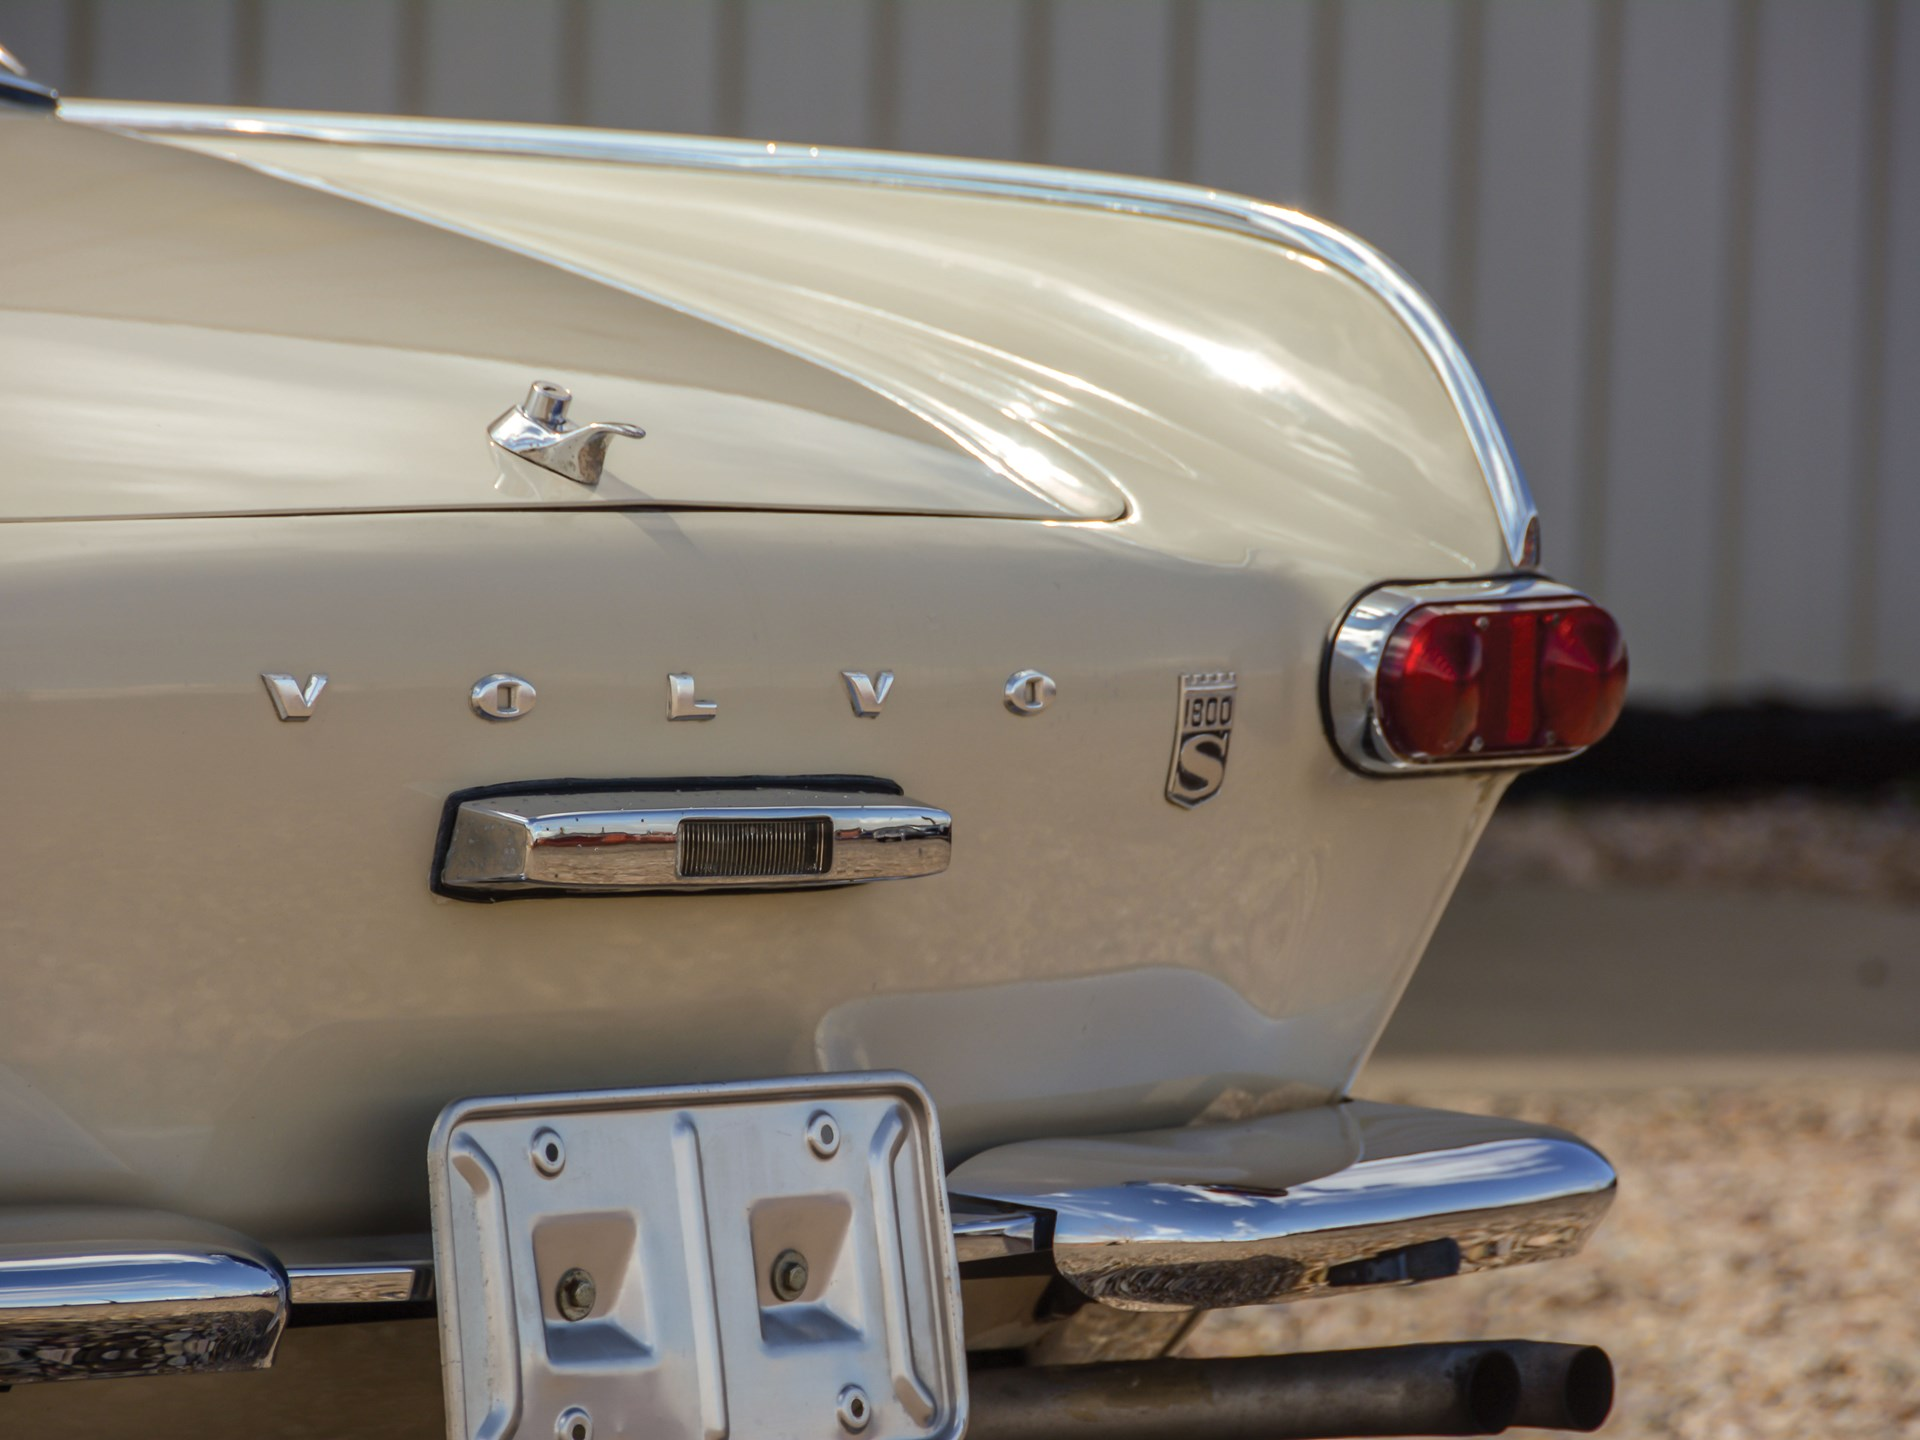 1965 Volvo 1800S fin detial